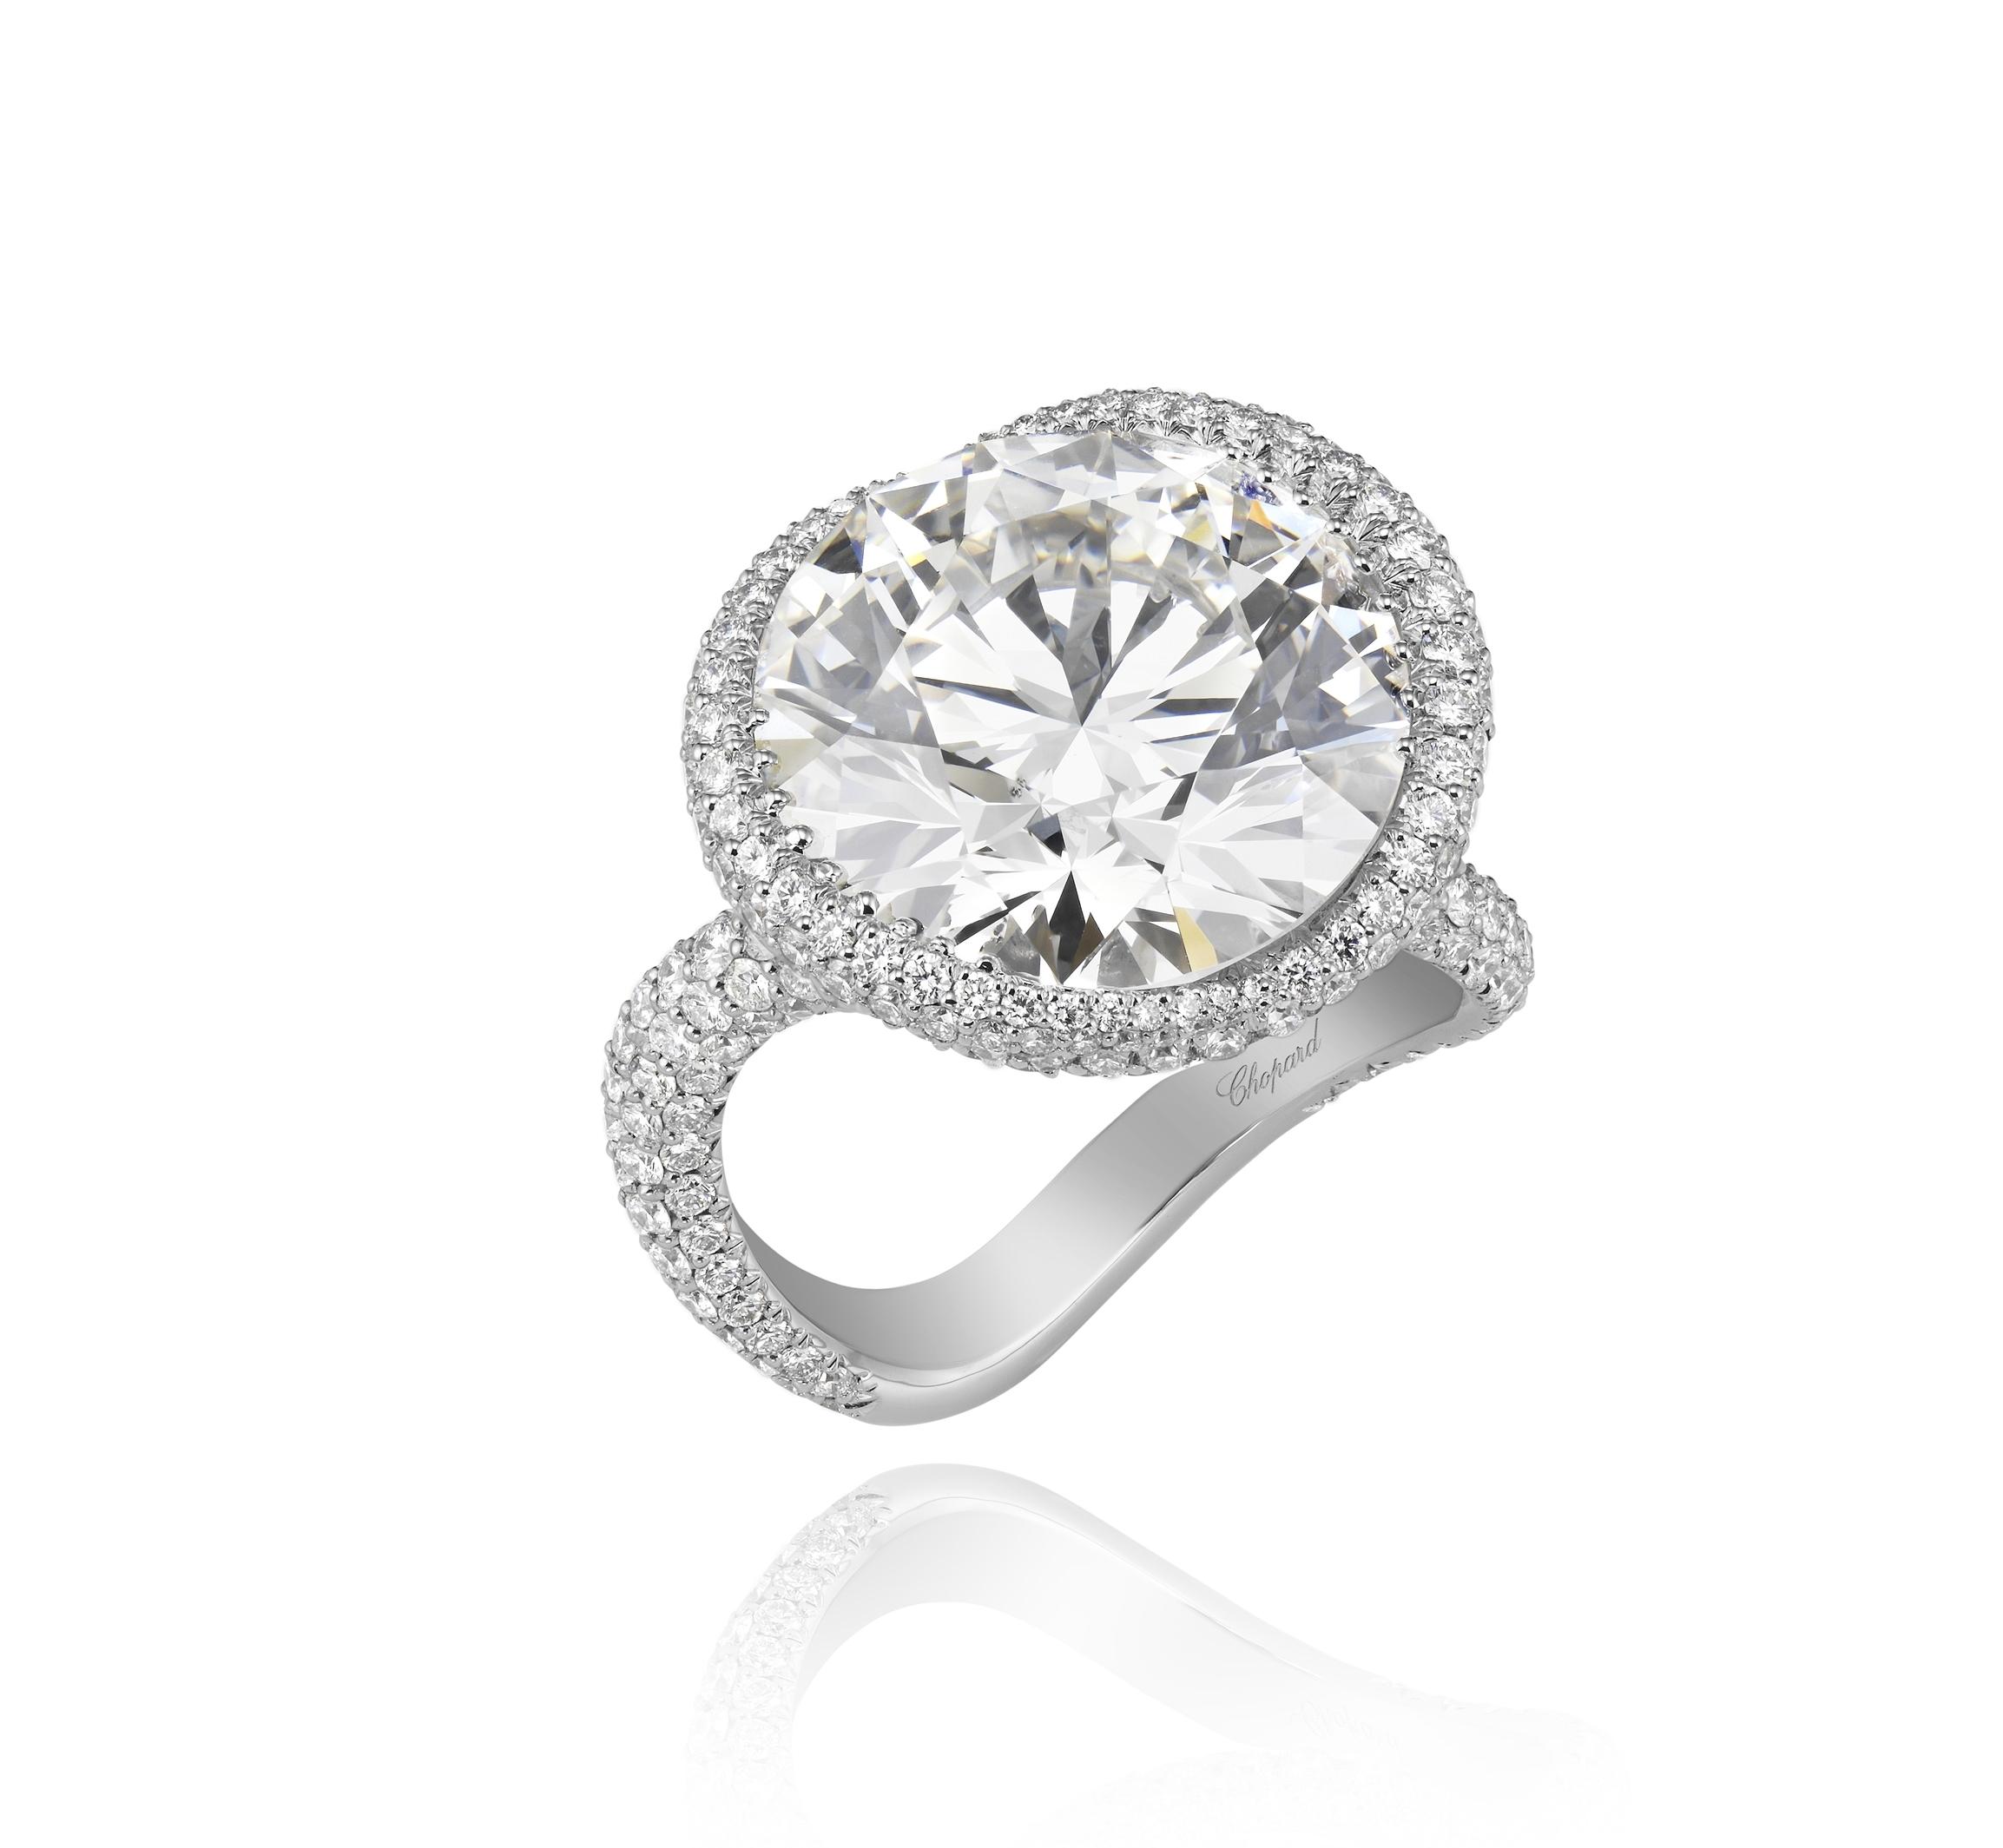 8207737-1001 High Jewellery Diamond Ring.jpg